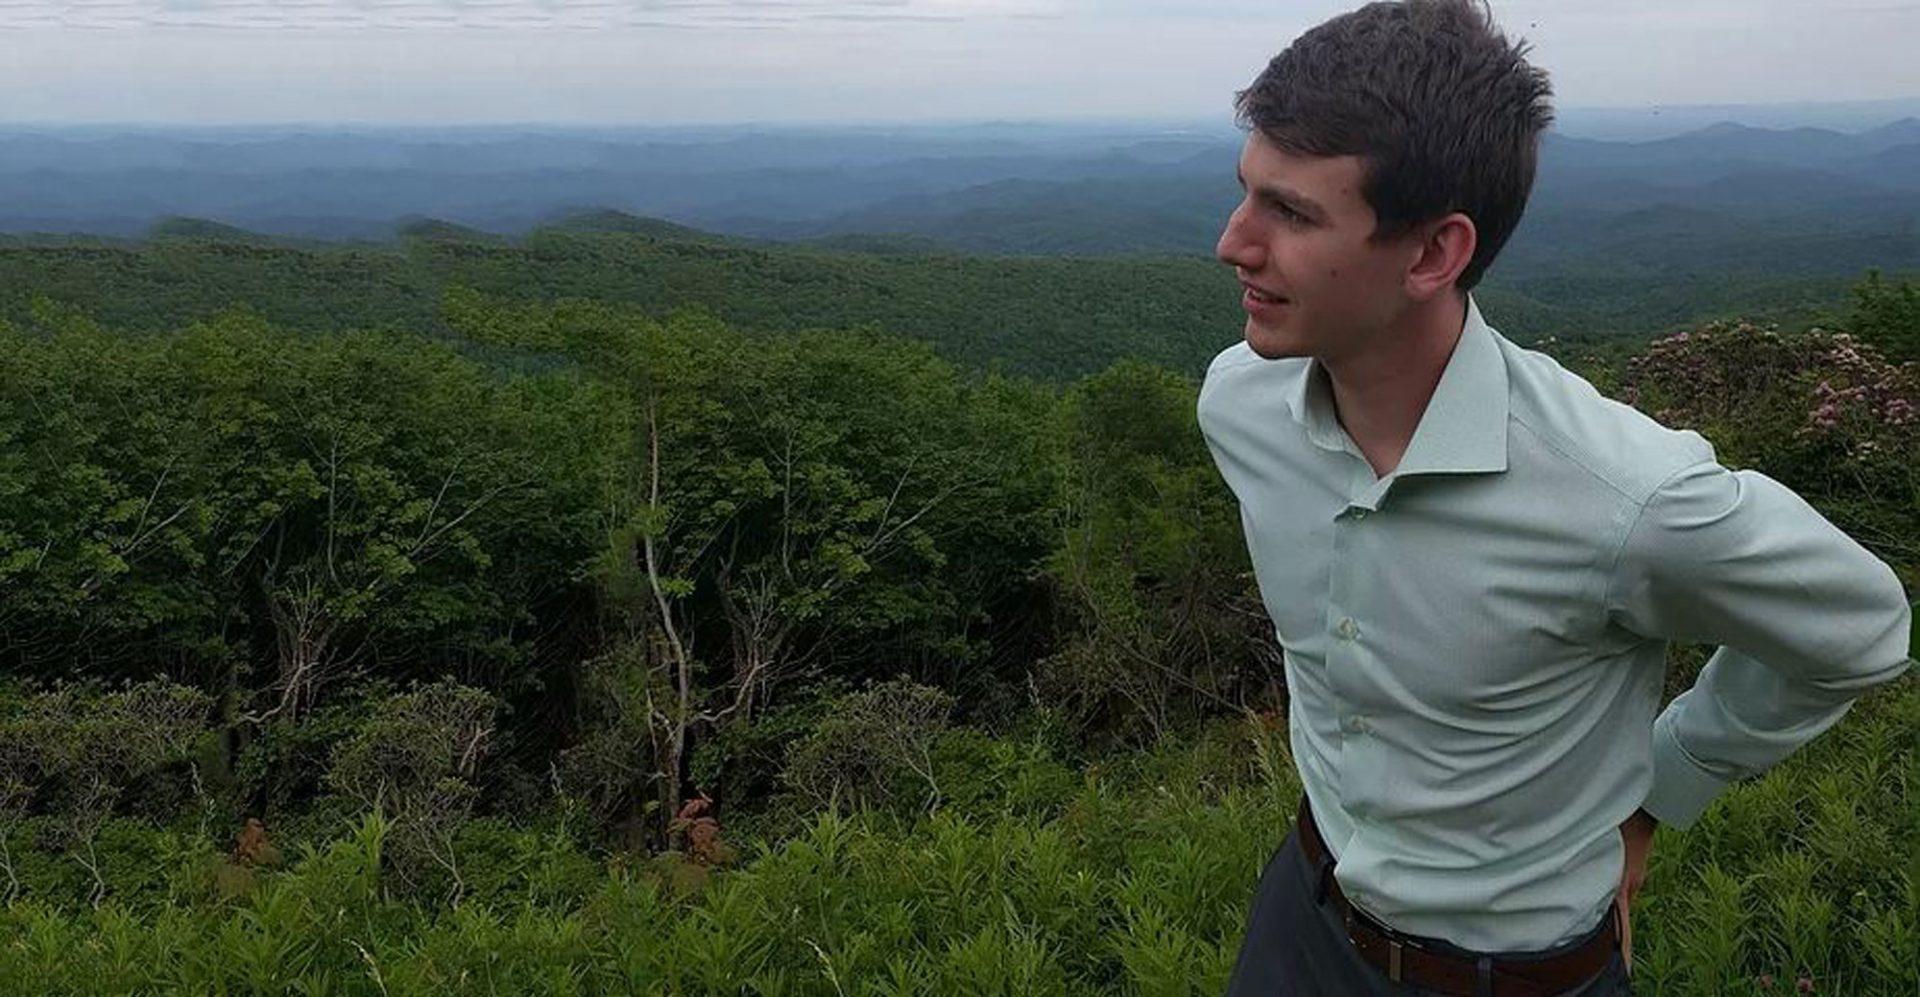 Appalachian student Robert Block running for local office